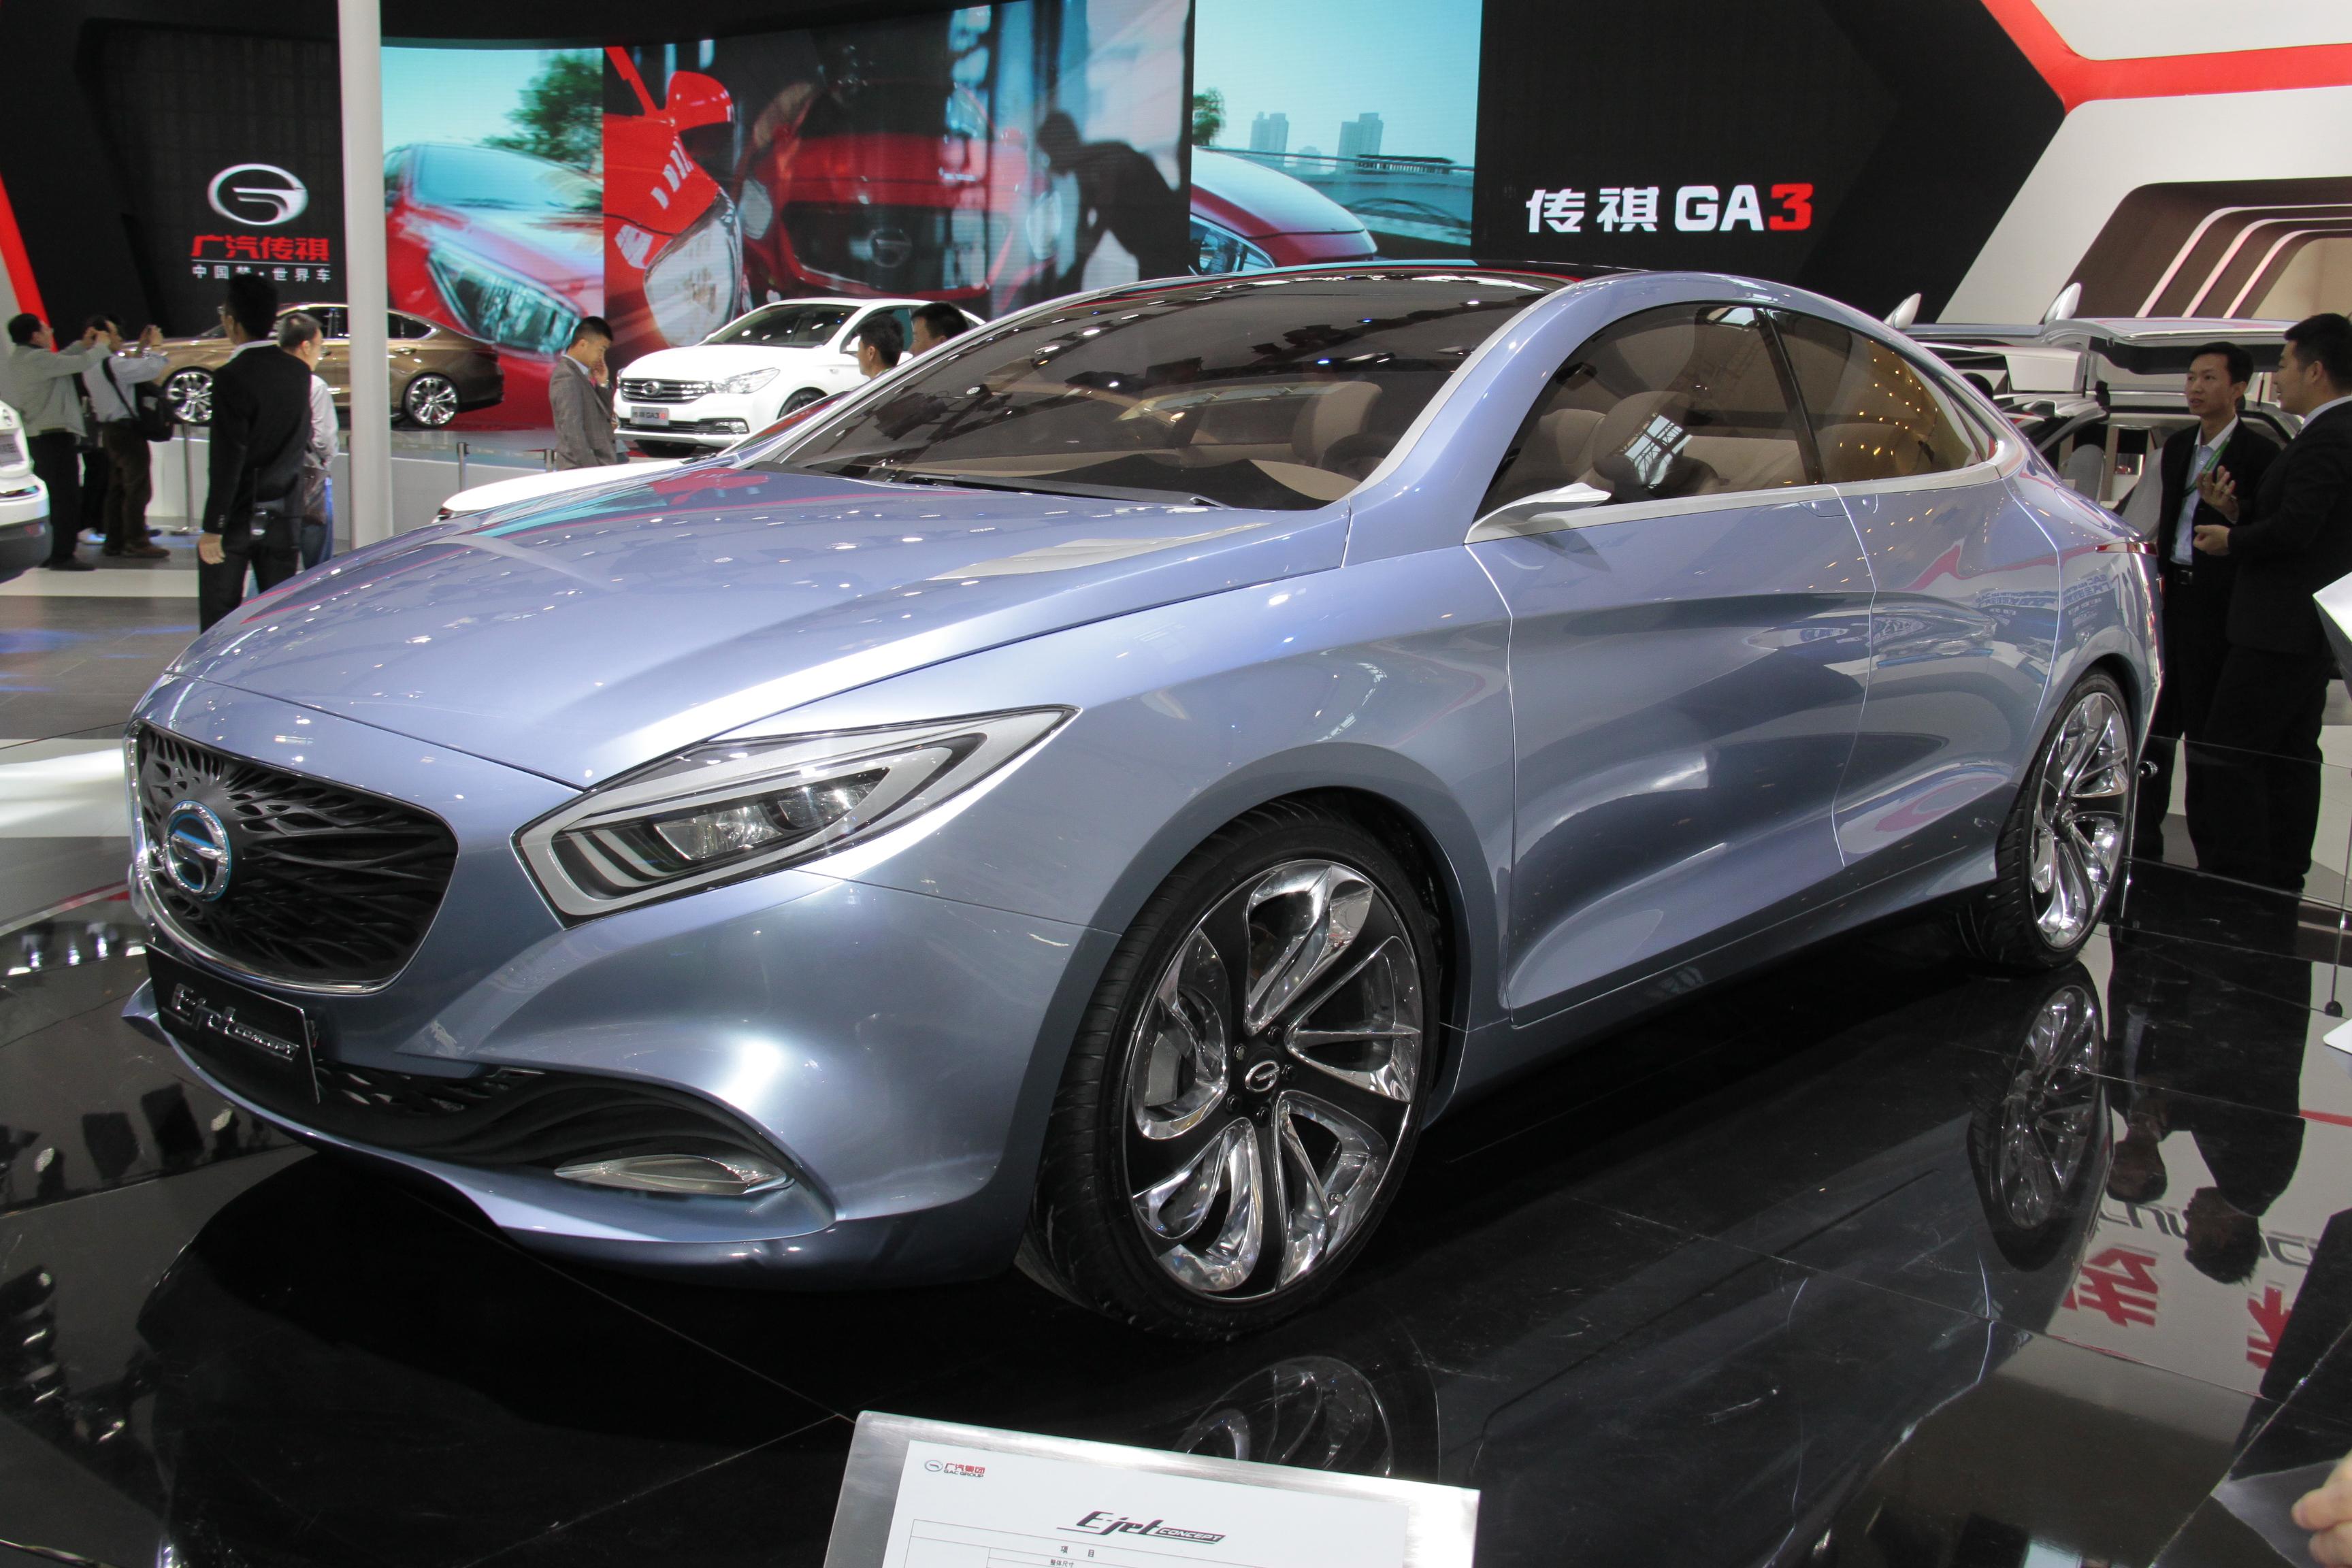 e-jet concept car 2014